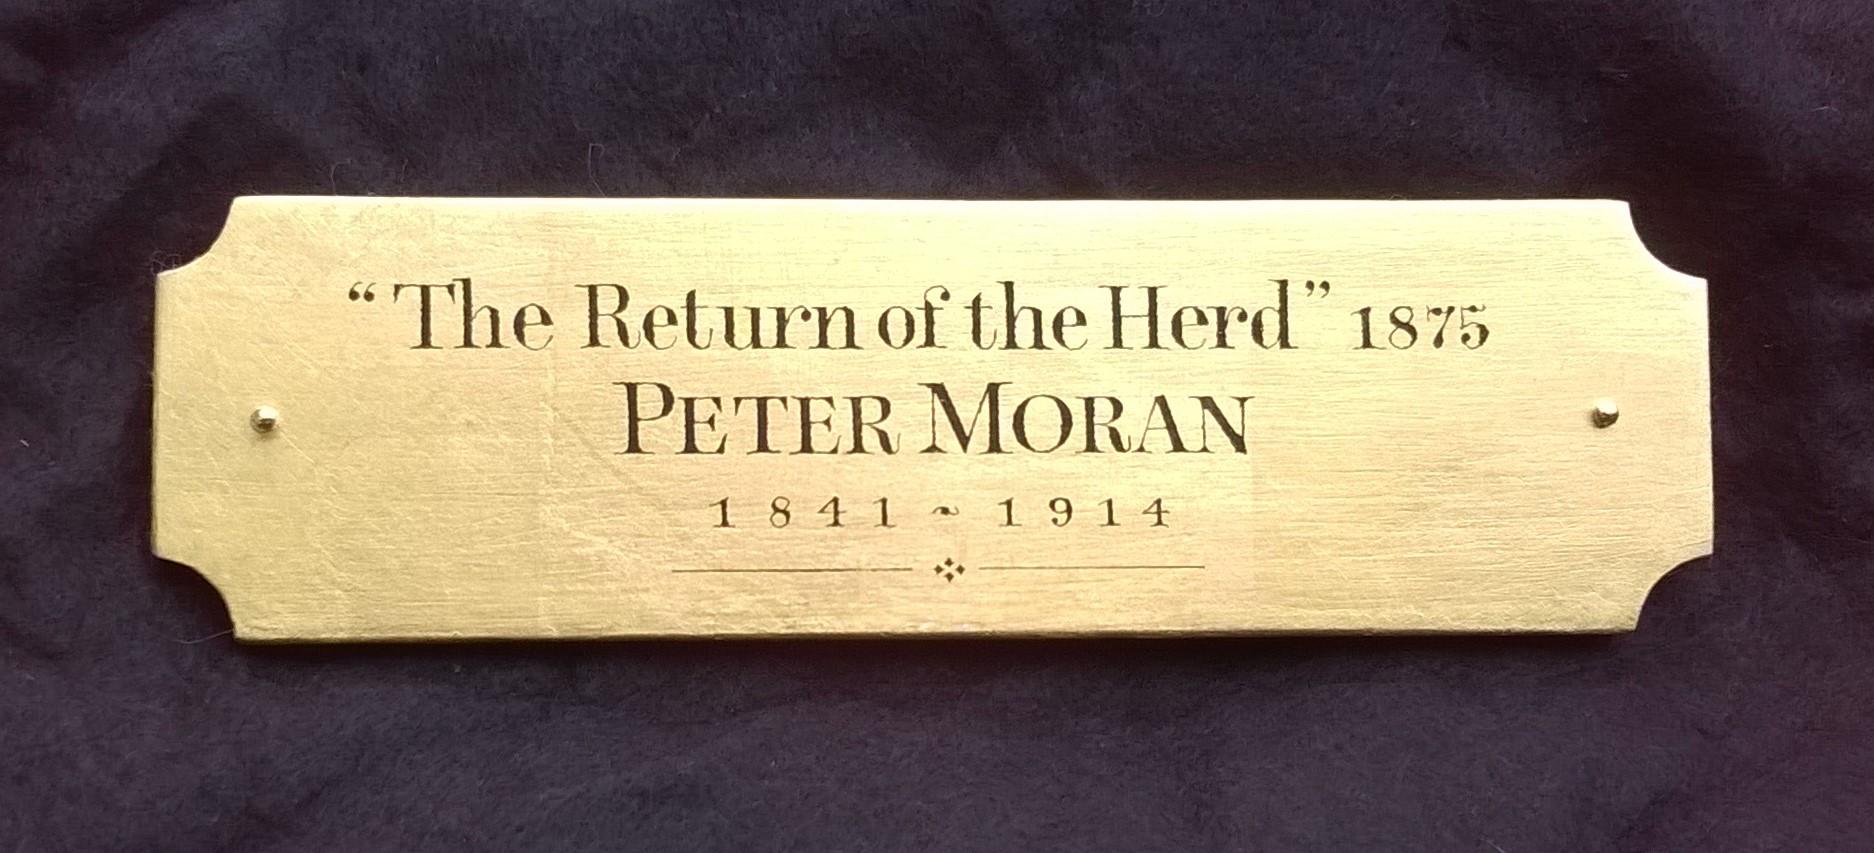 "Peter Moran, 'The Return of the Herd', 2.5"" x 8"""